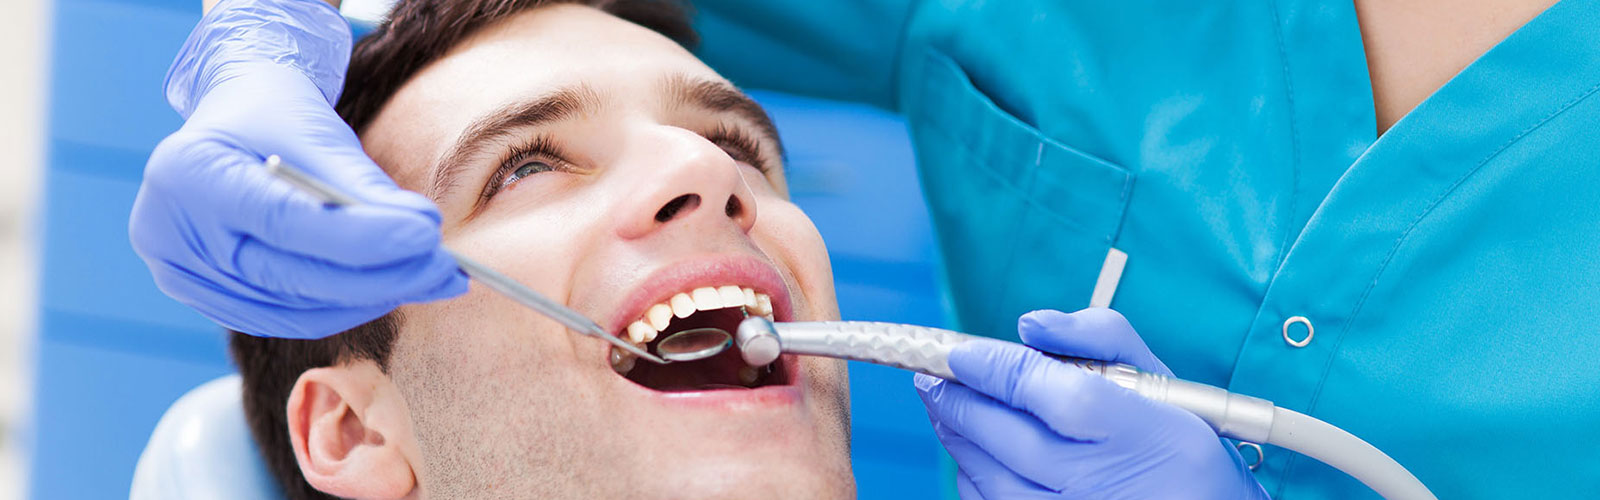 Periodontic-Services